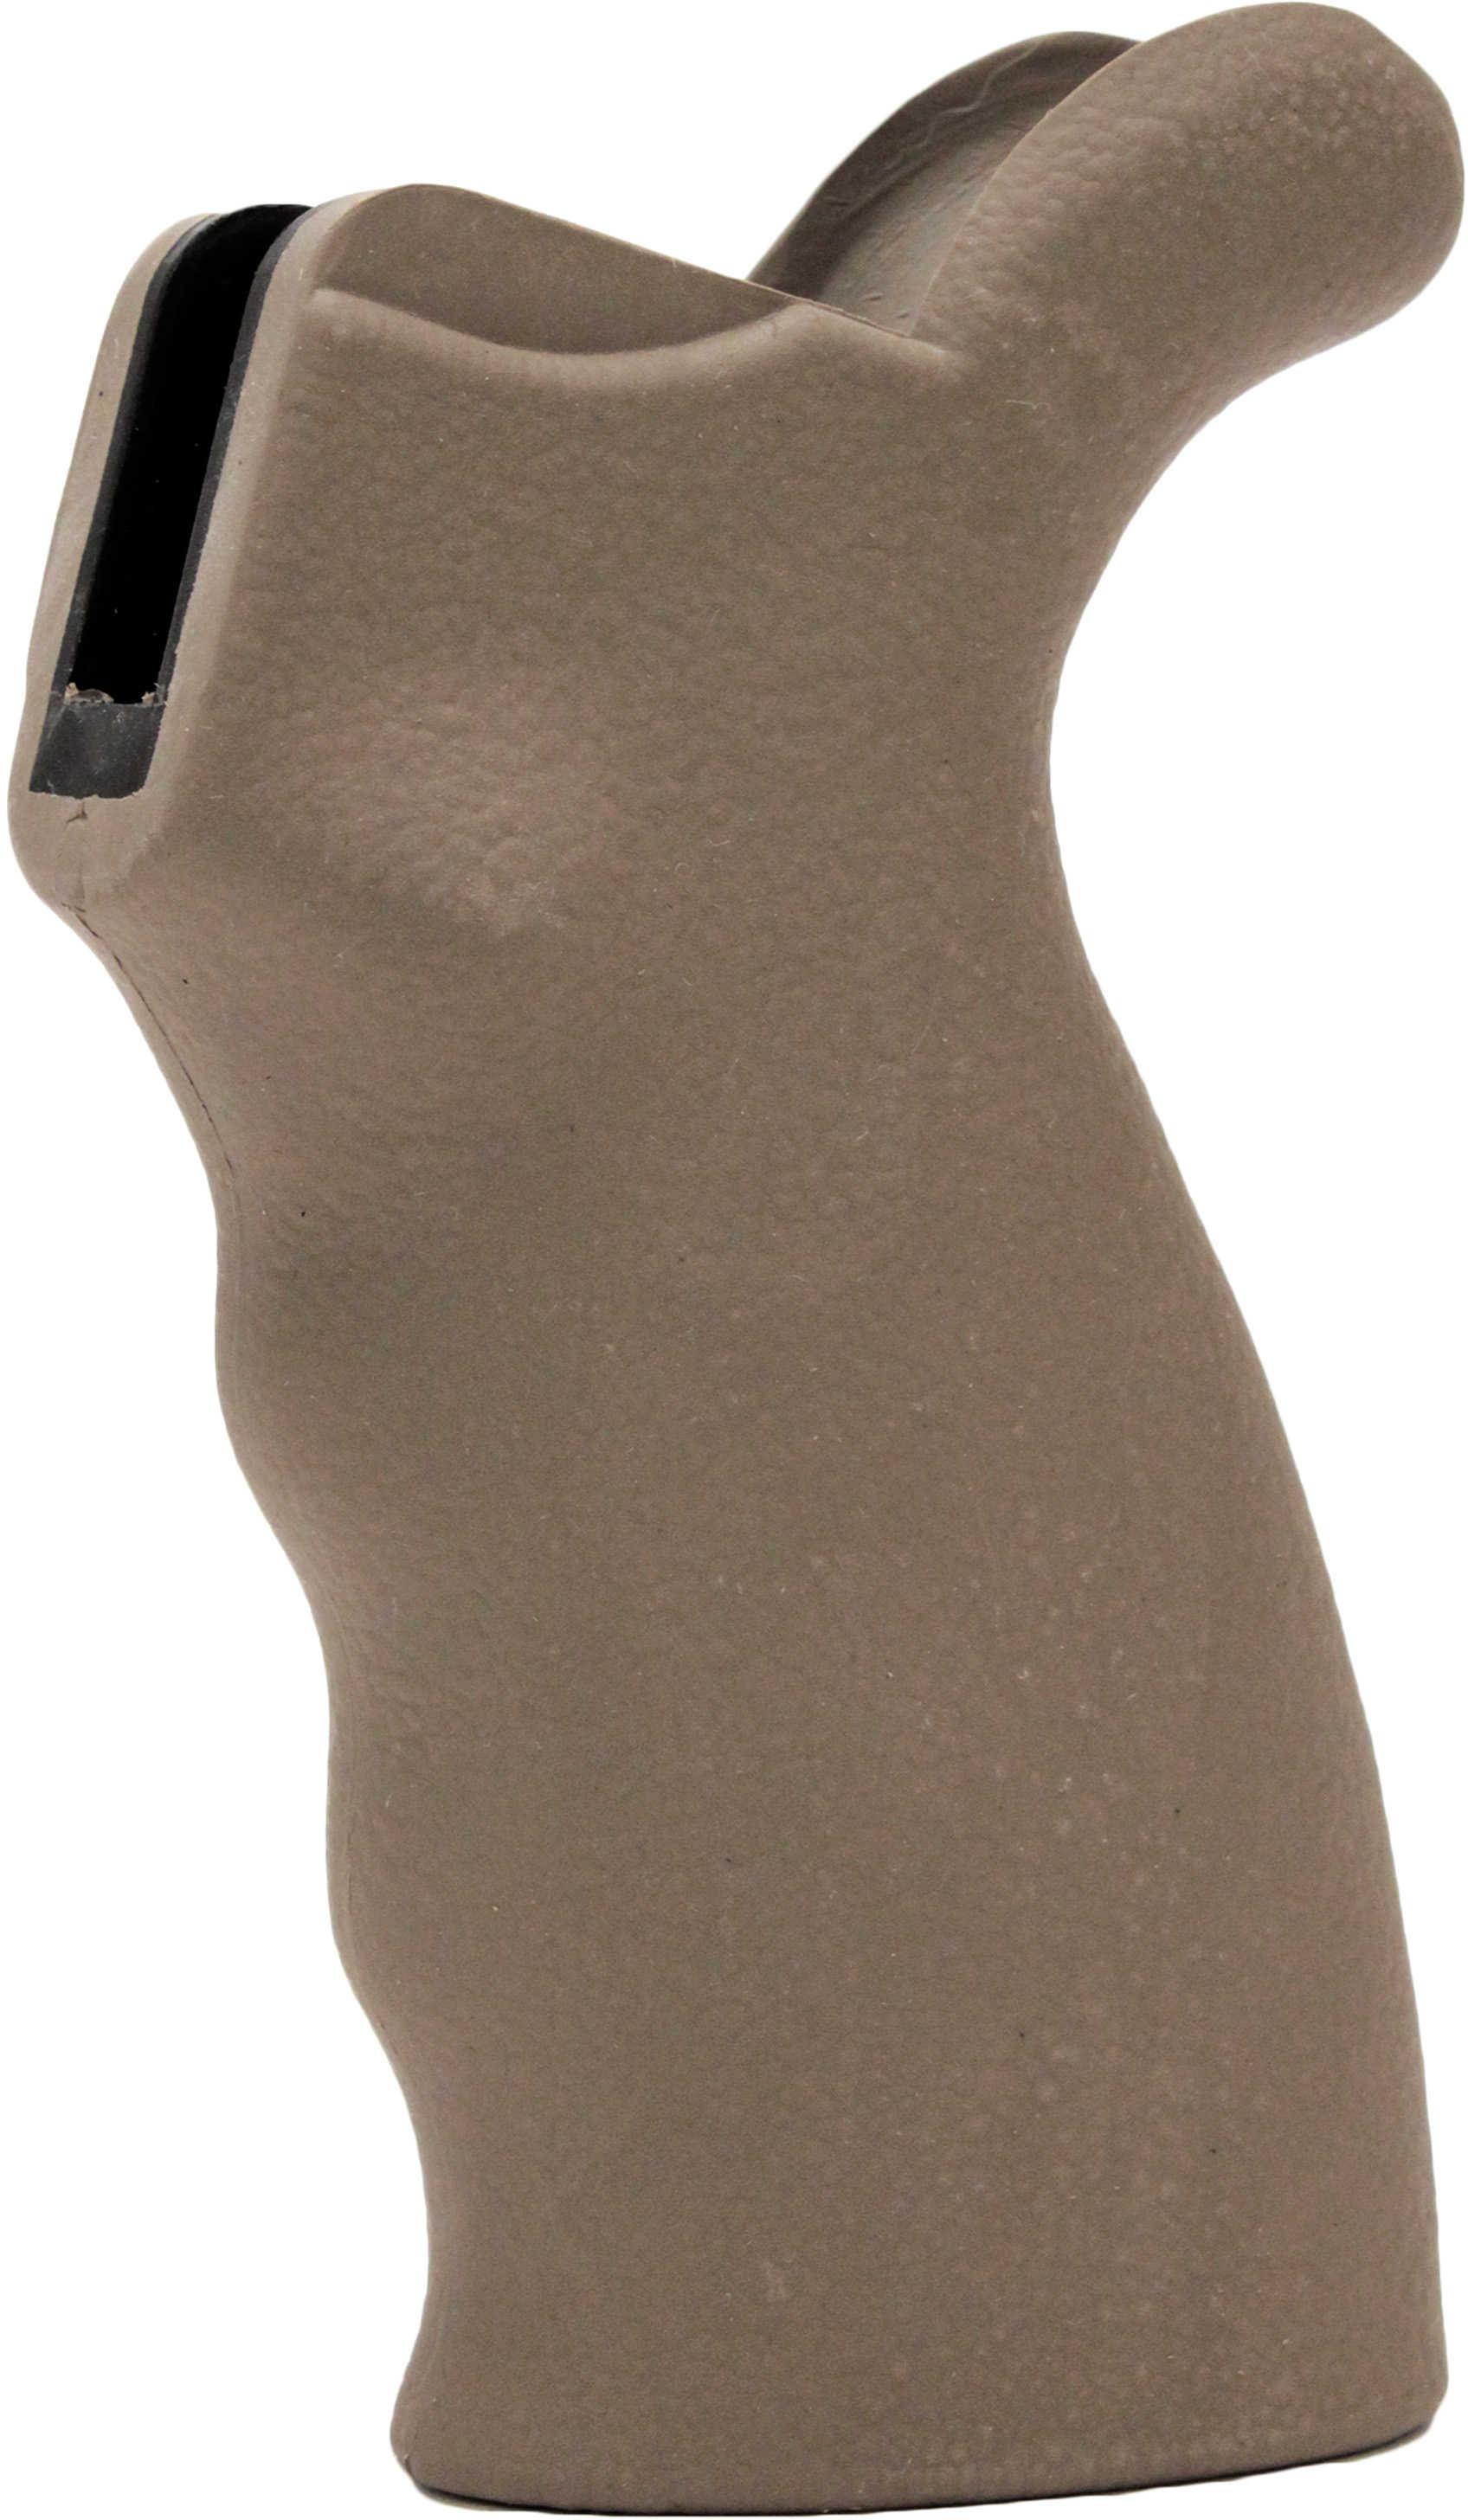 2 AR15/AR10 Grip Kit Ambidextrous Flat Dark Earth Md: 4010-De